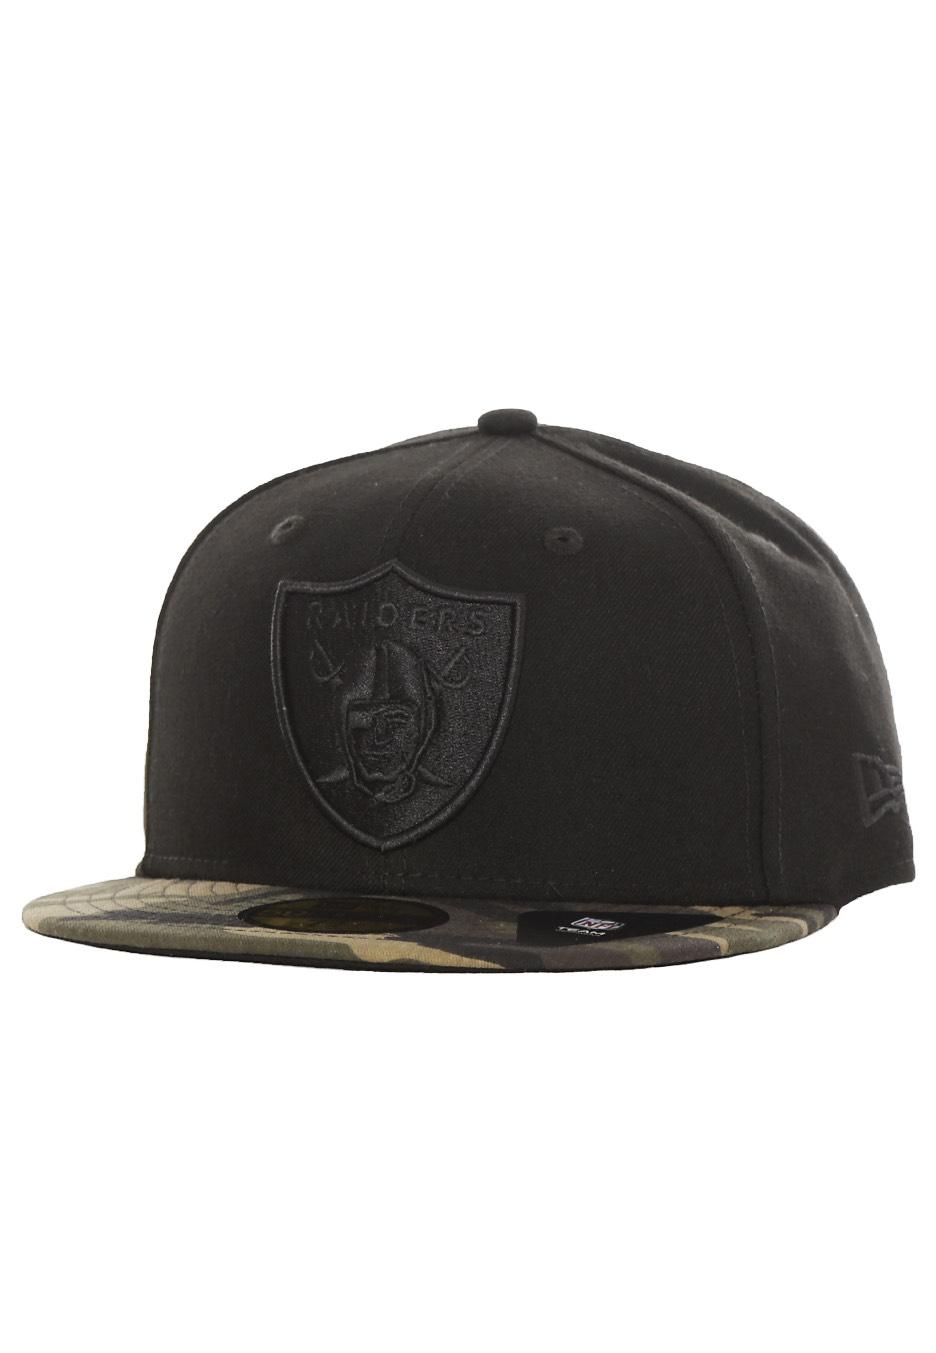 New Era - Camo 59Fifty Oakland Raiders Black Woodland Camo - Cap -  Streetwear Shop - Impericon.com UK c852f97579f